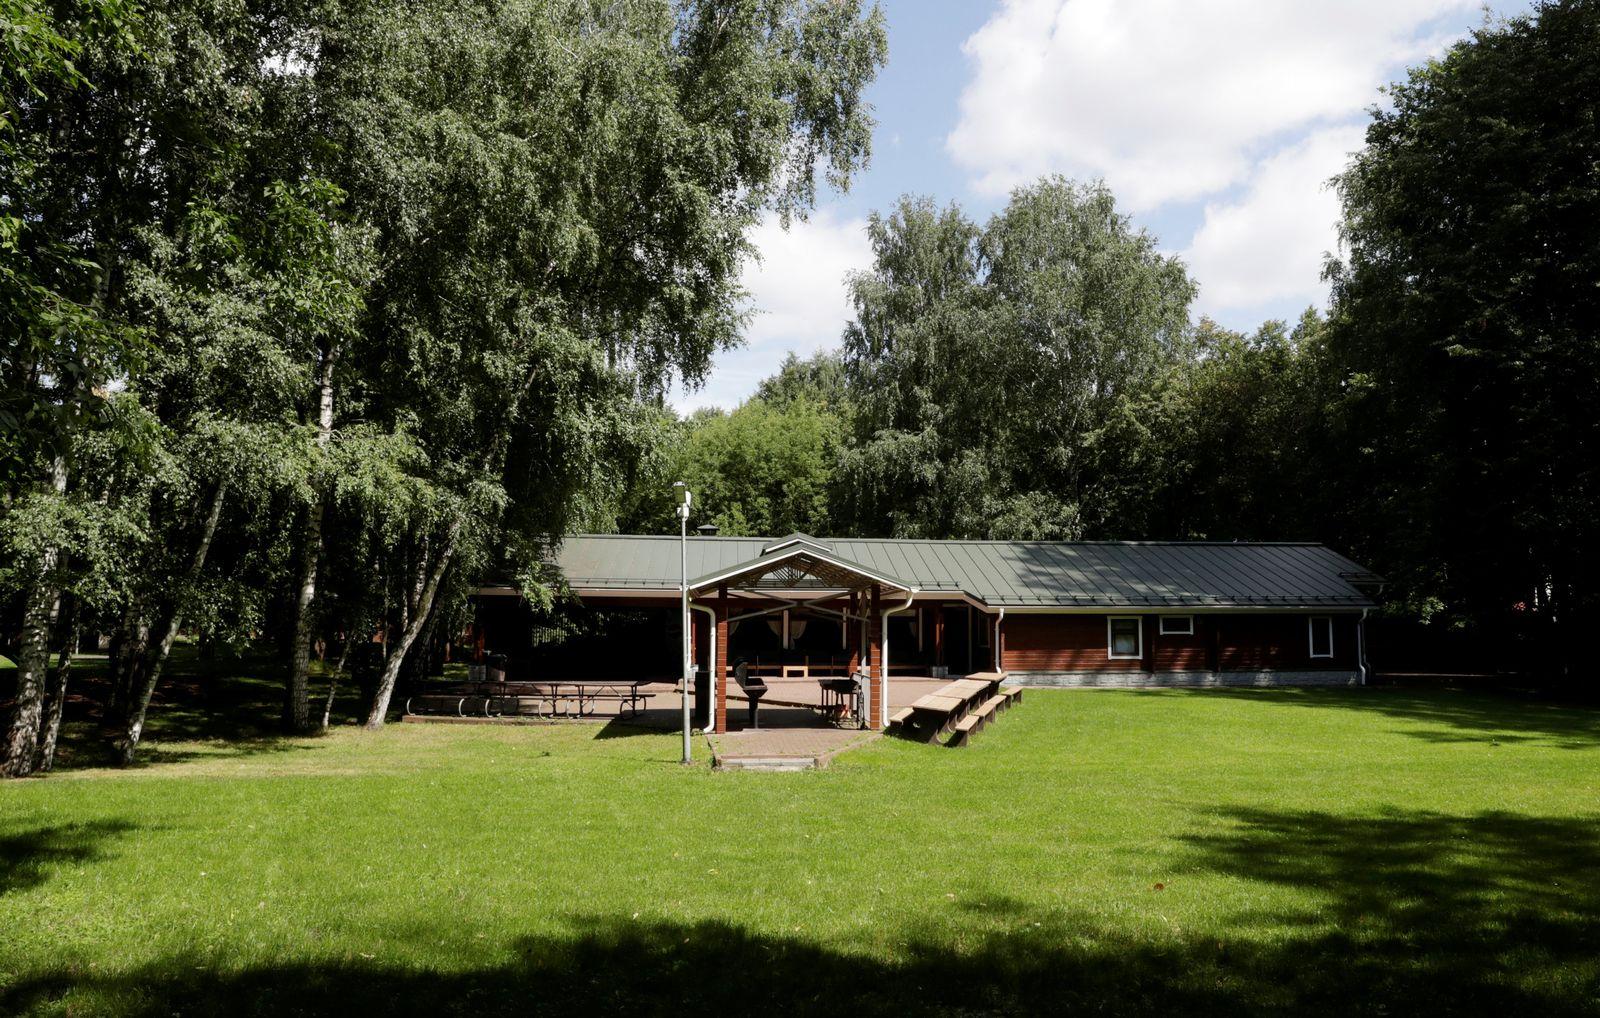 Serebryany Bor/ Landhaus